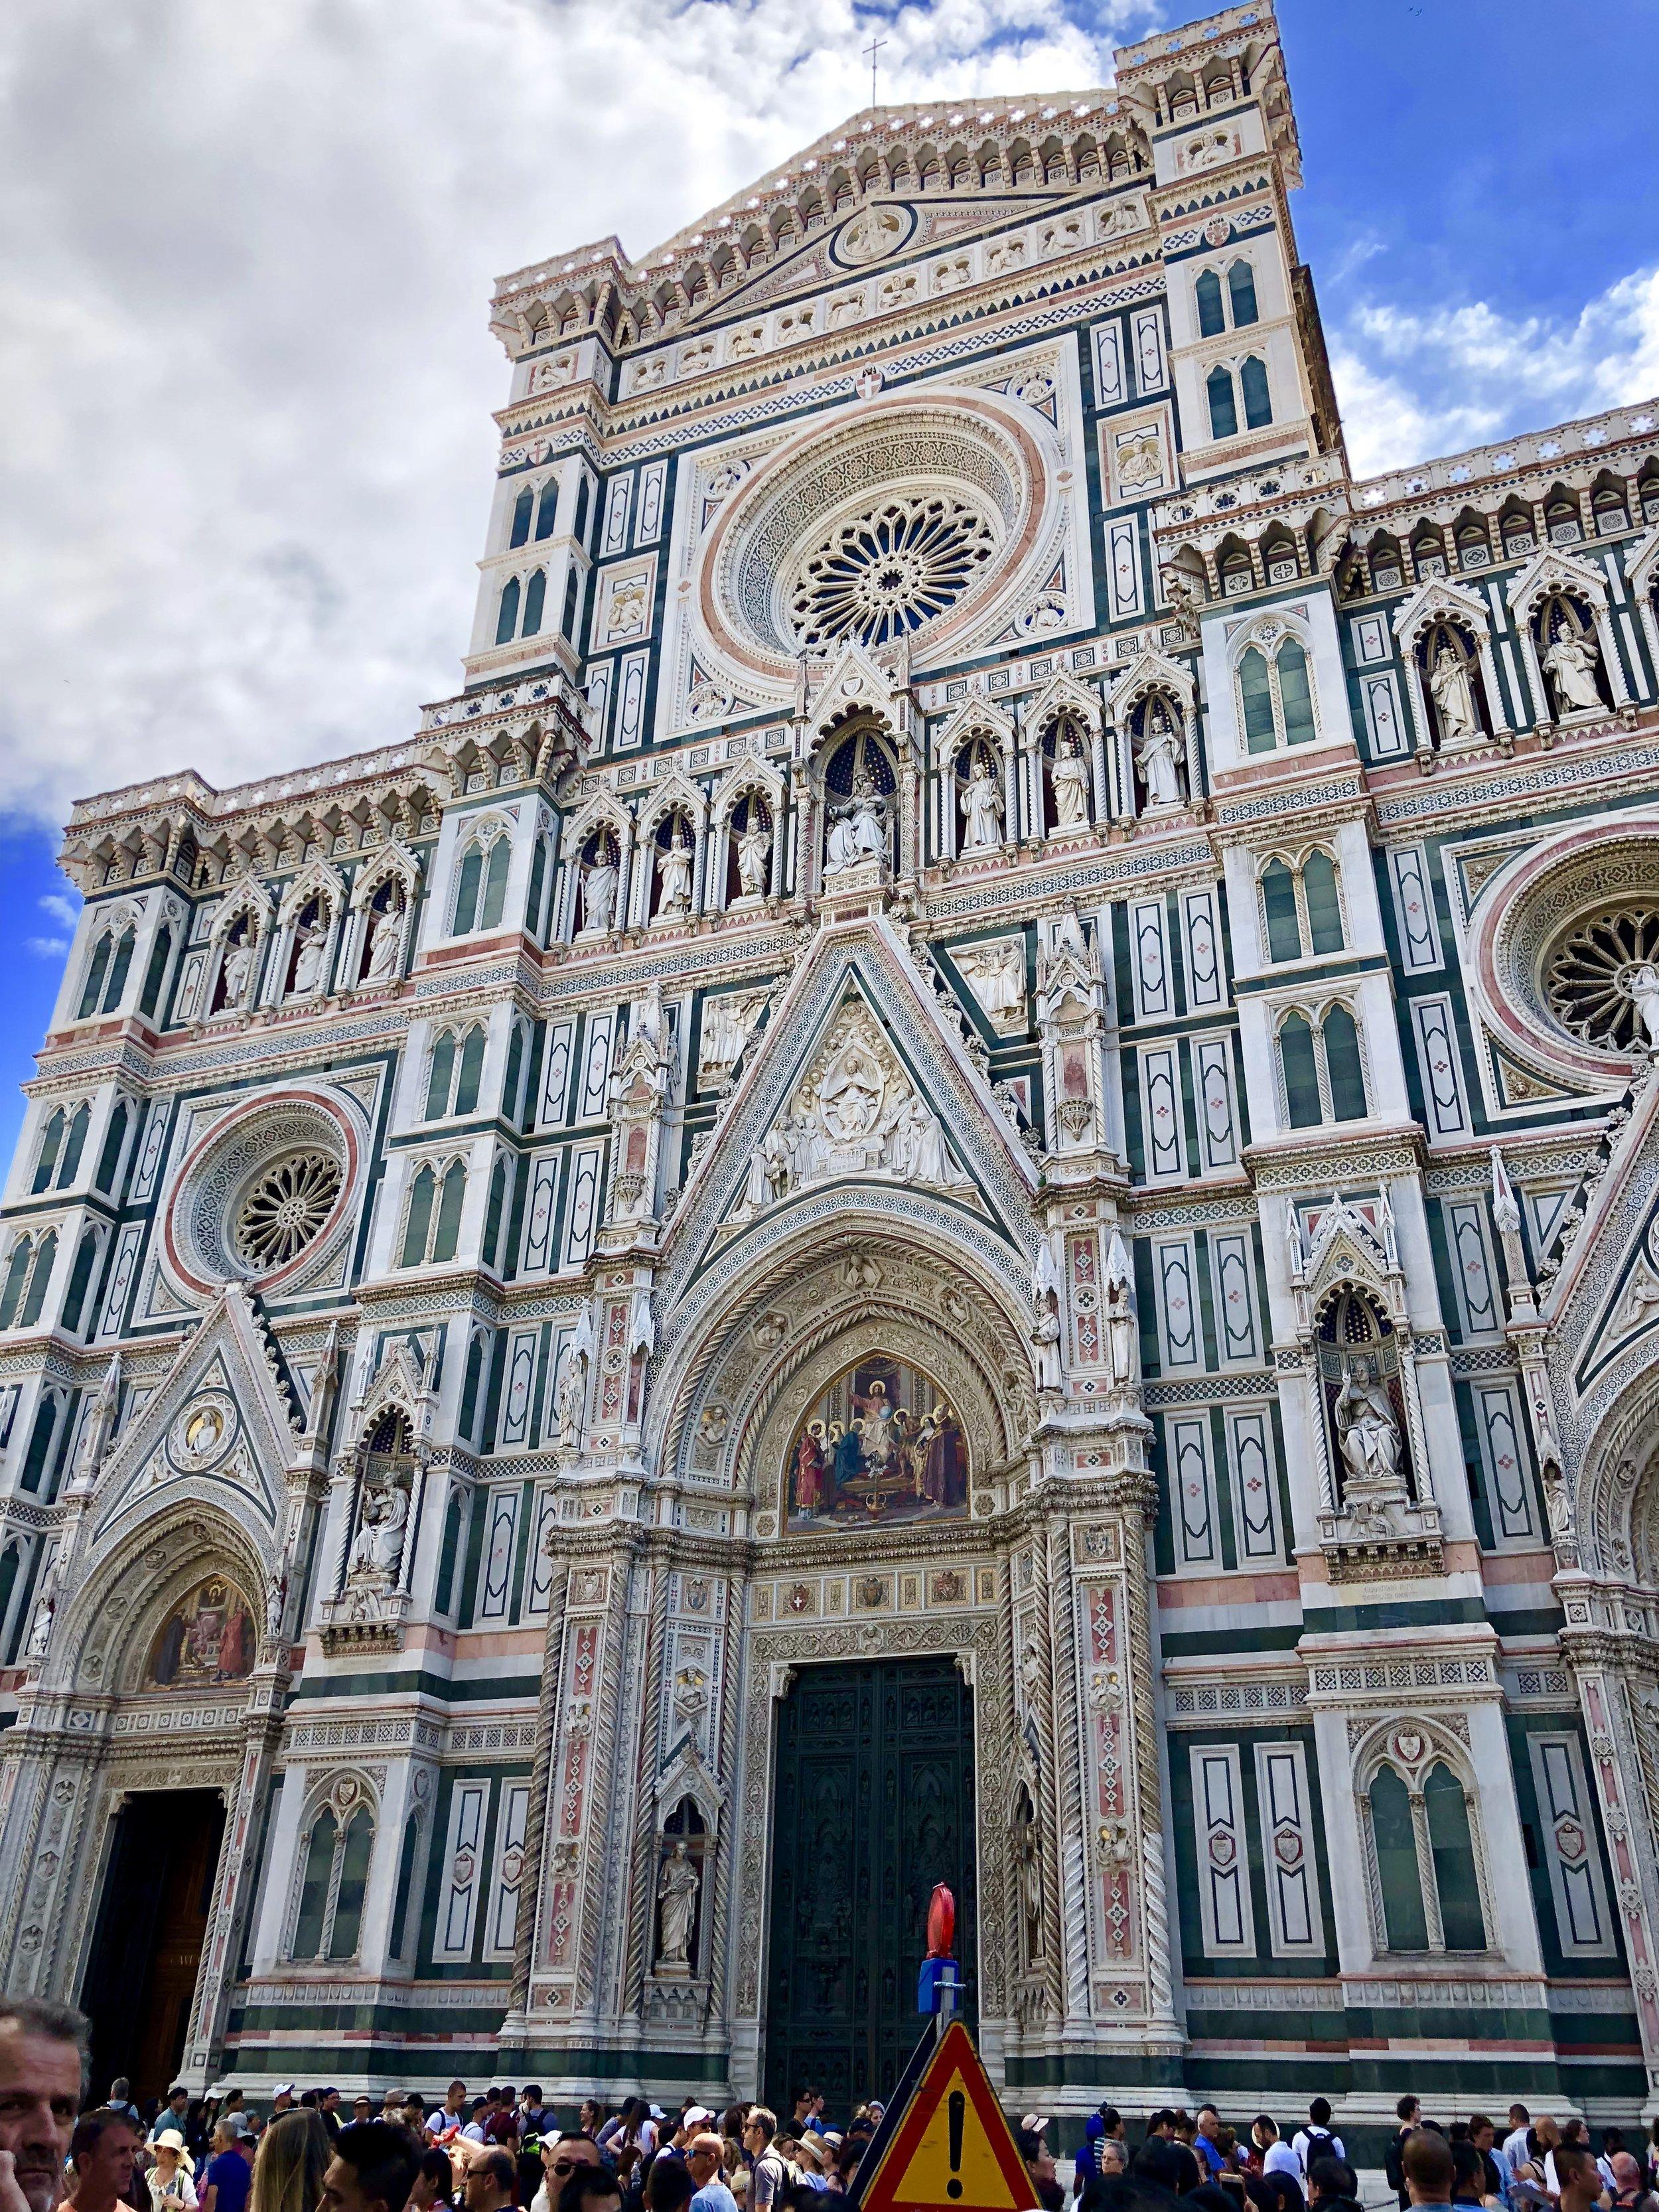 Duomo (Florence, Italy)